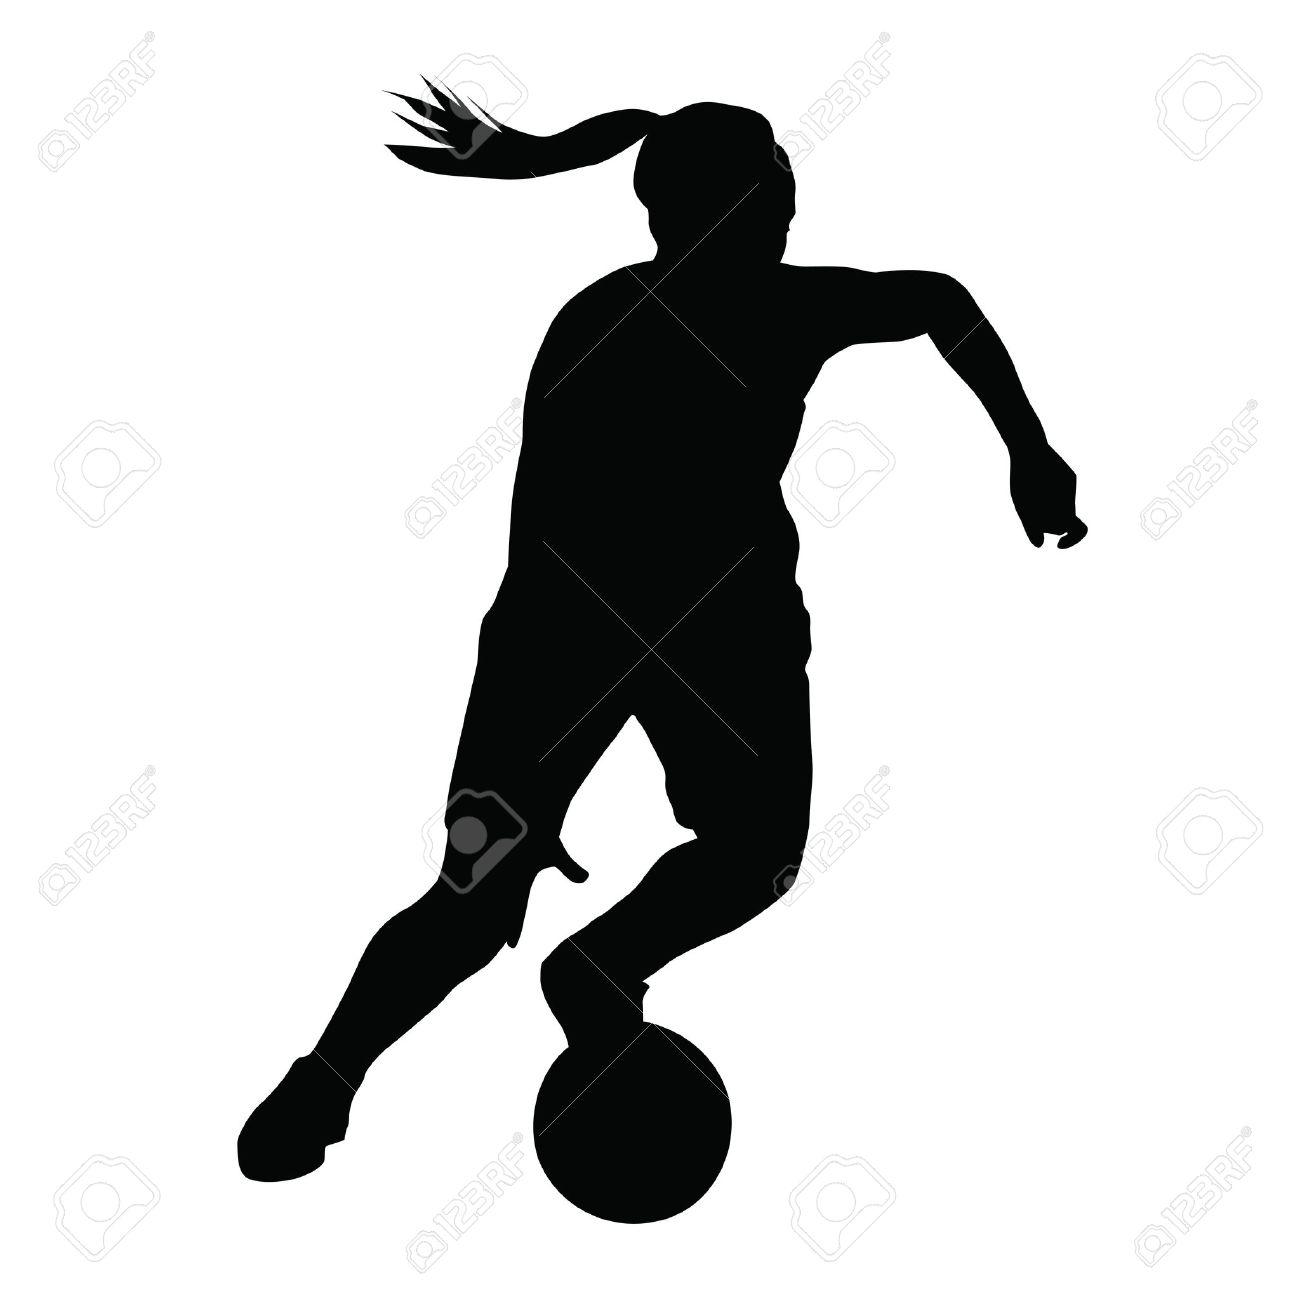 1300x1300 Basketball Player Vector Silhouette, Woman, Girl, Running